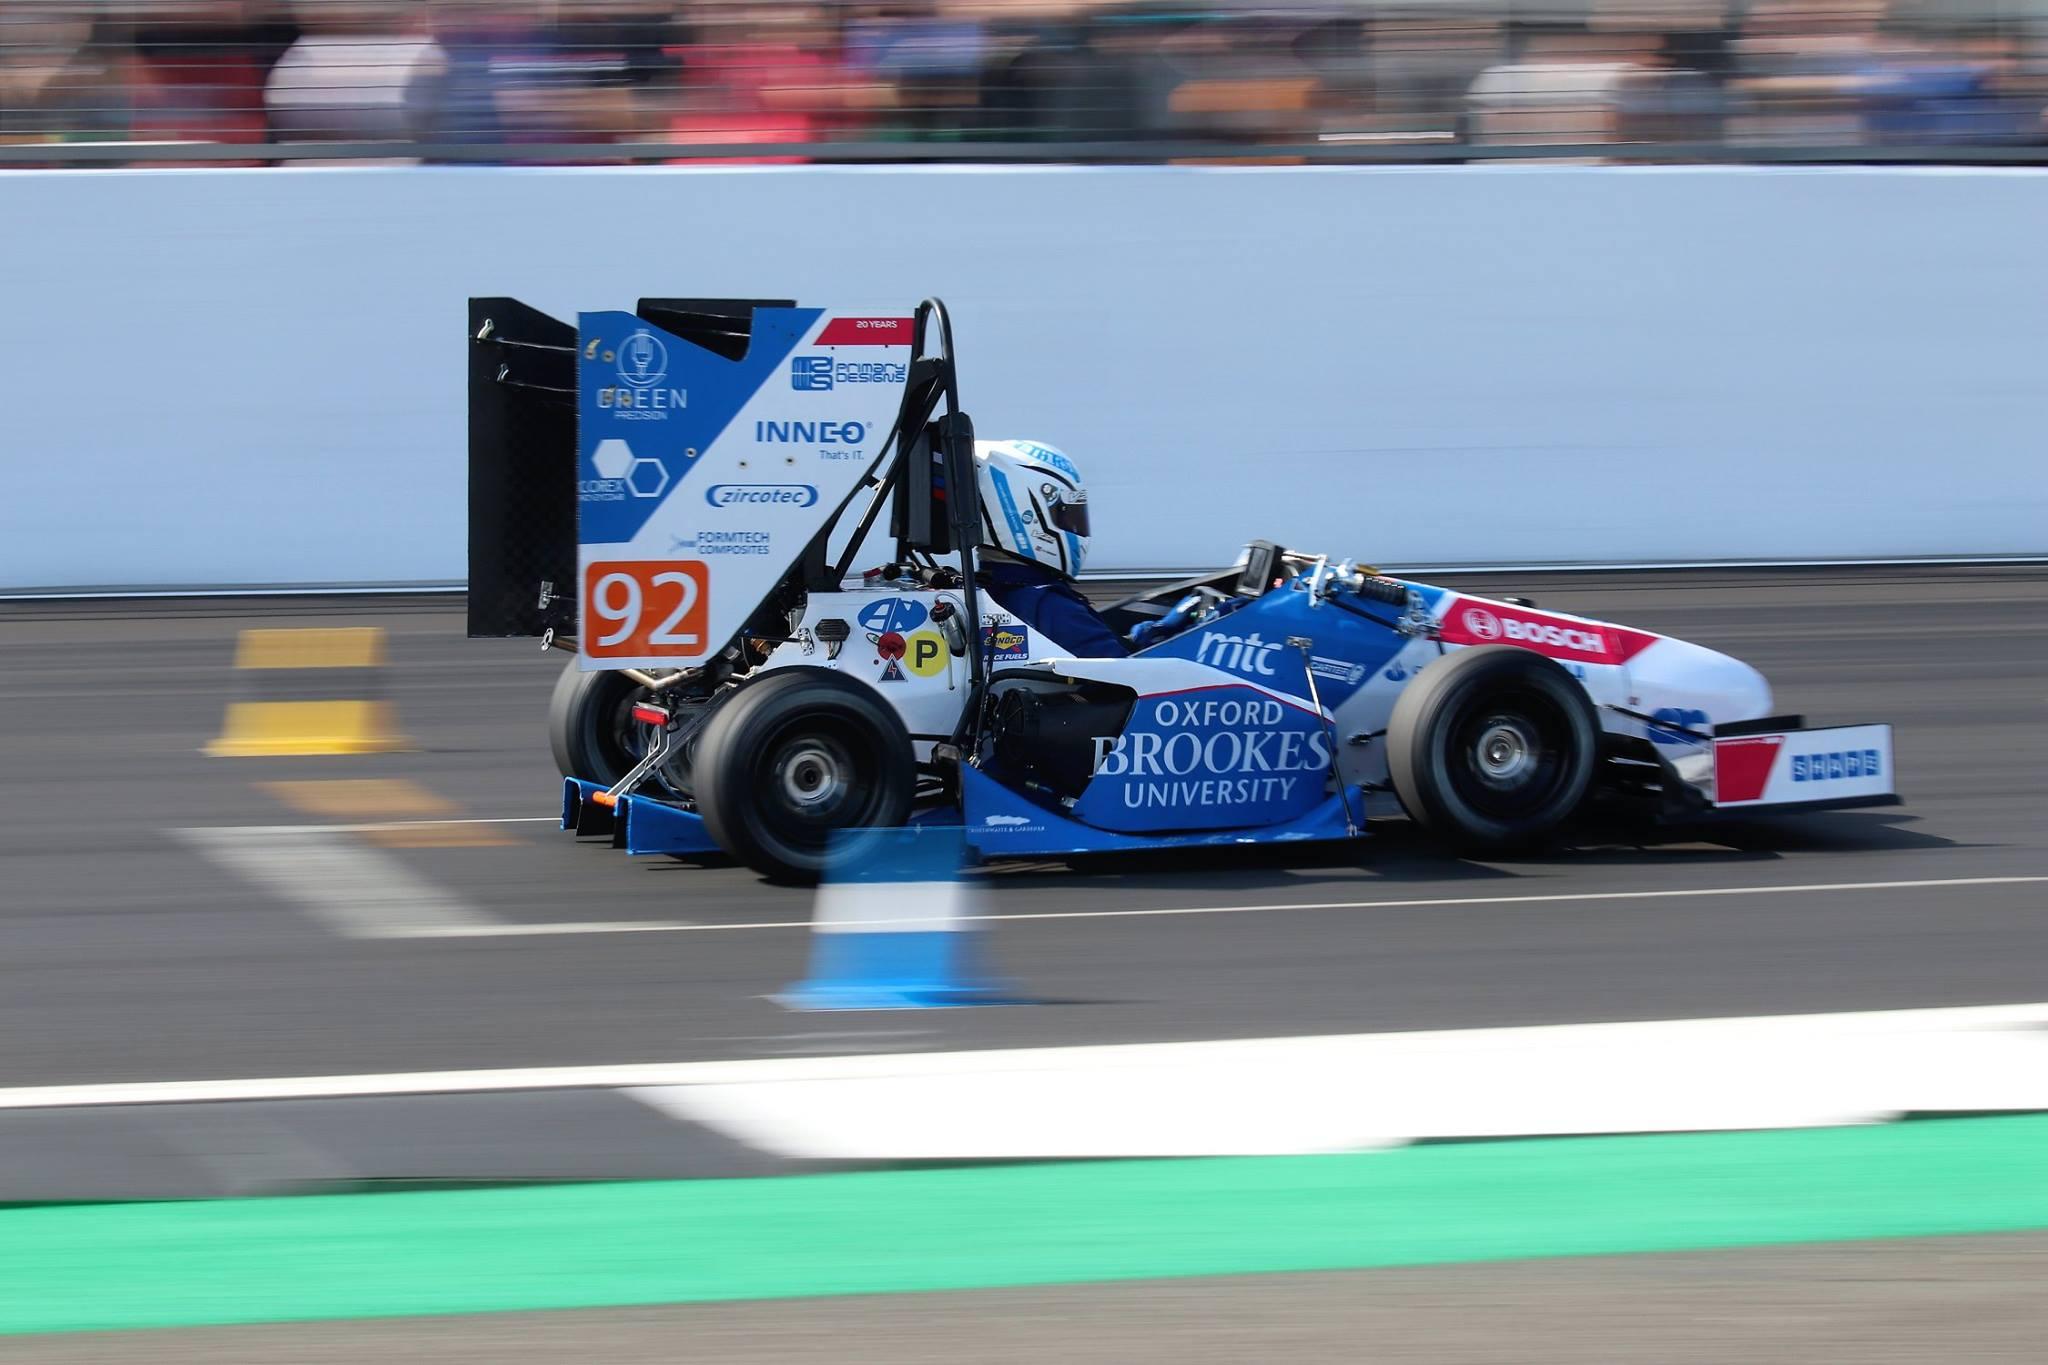 OXFORD BROOKES FORMULA STUDENT RACING CAR 2018